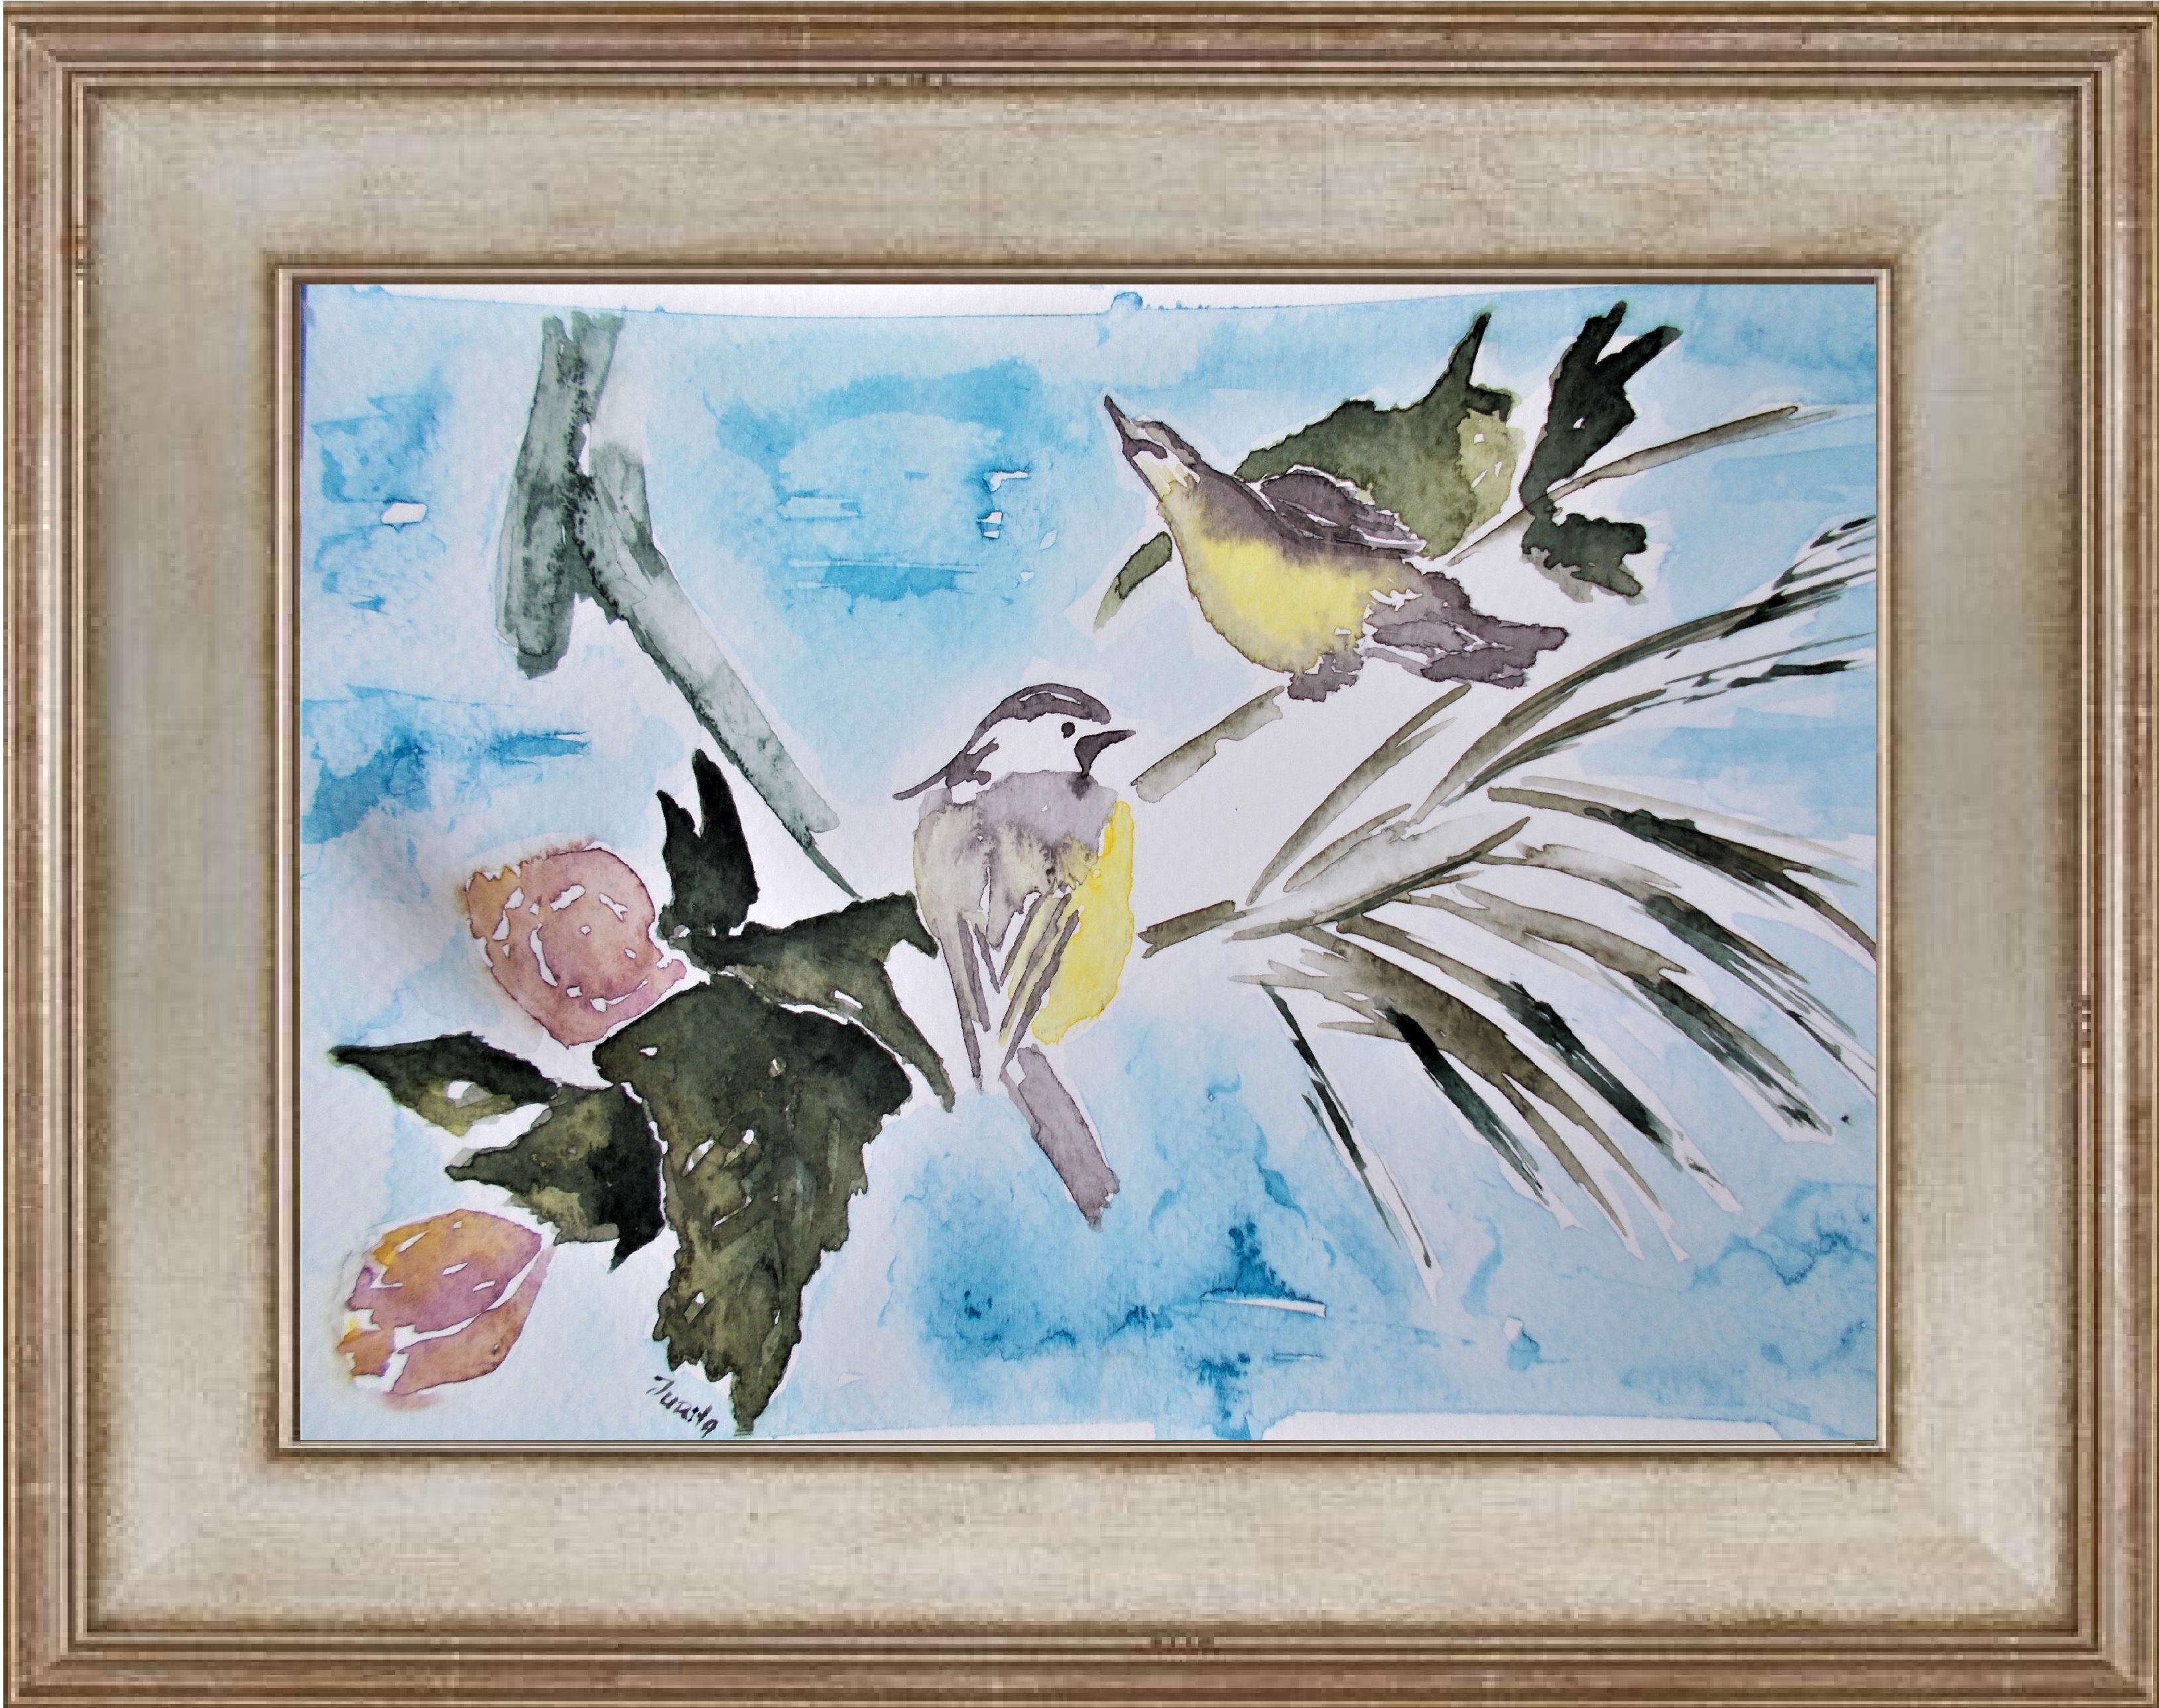 Good Morning_Painting_watercolor_painting_sign_by_Jurita_Kalite (4)